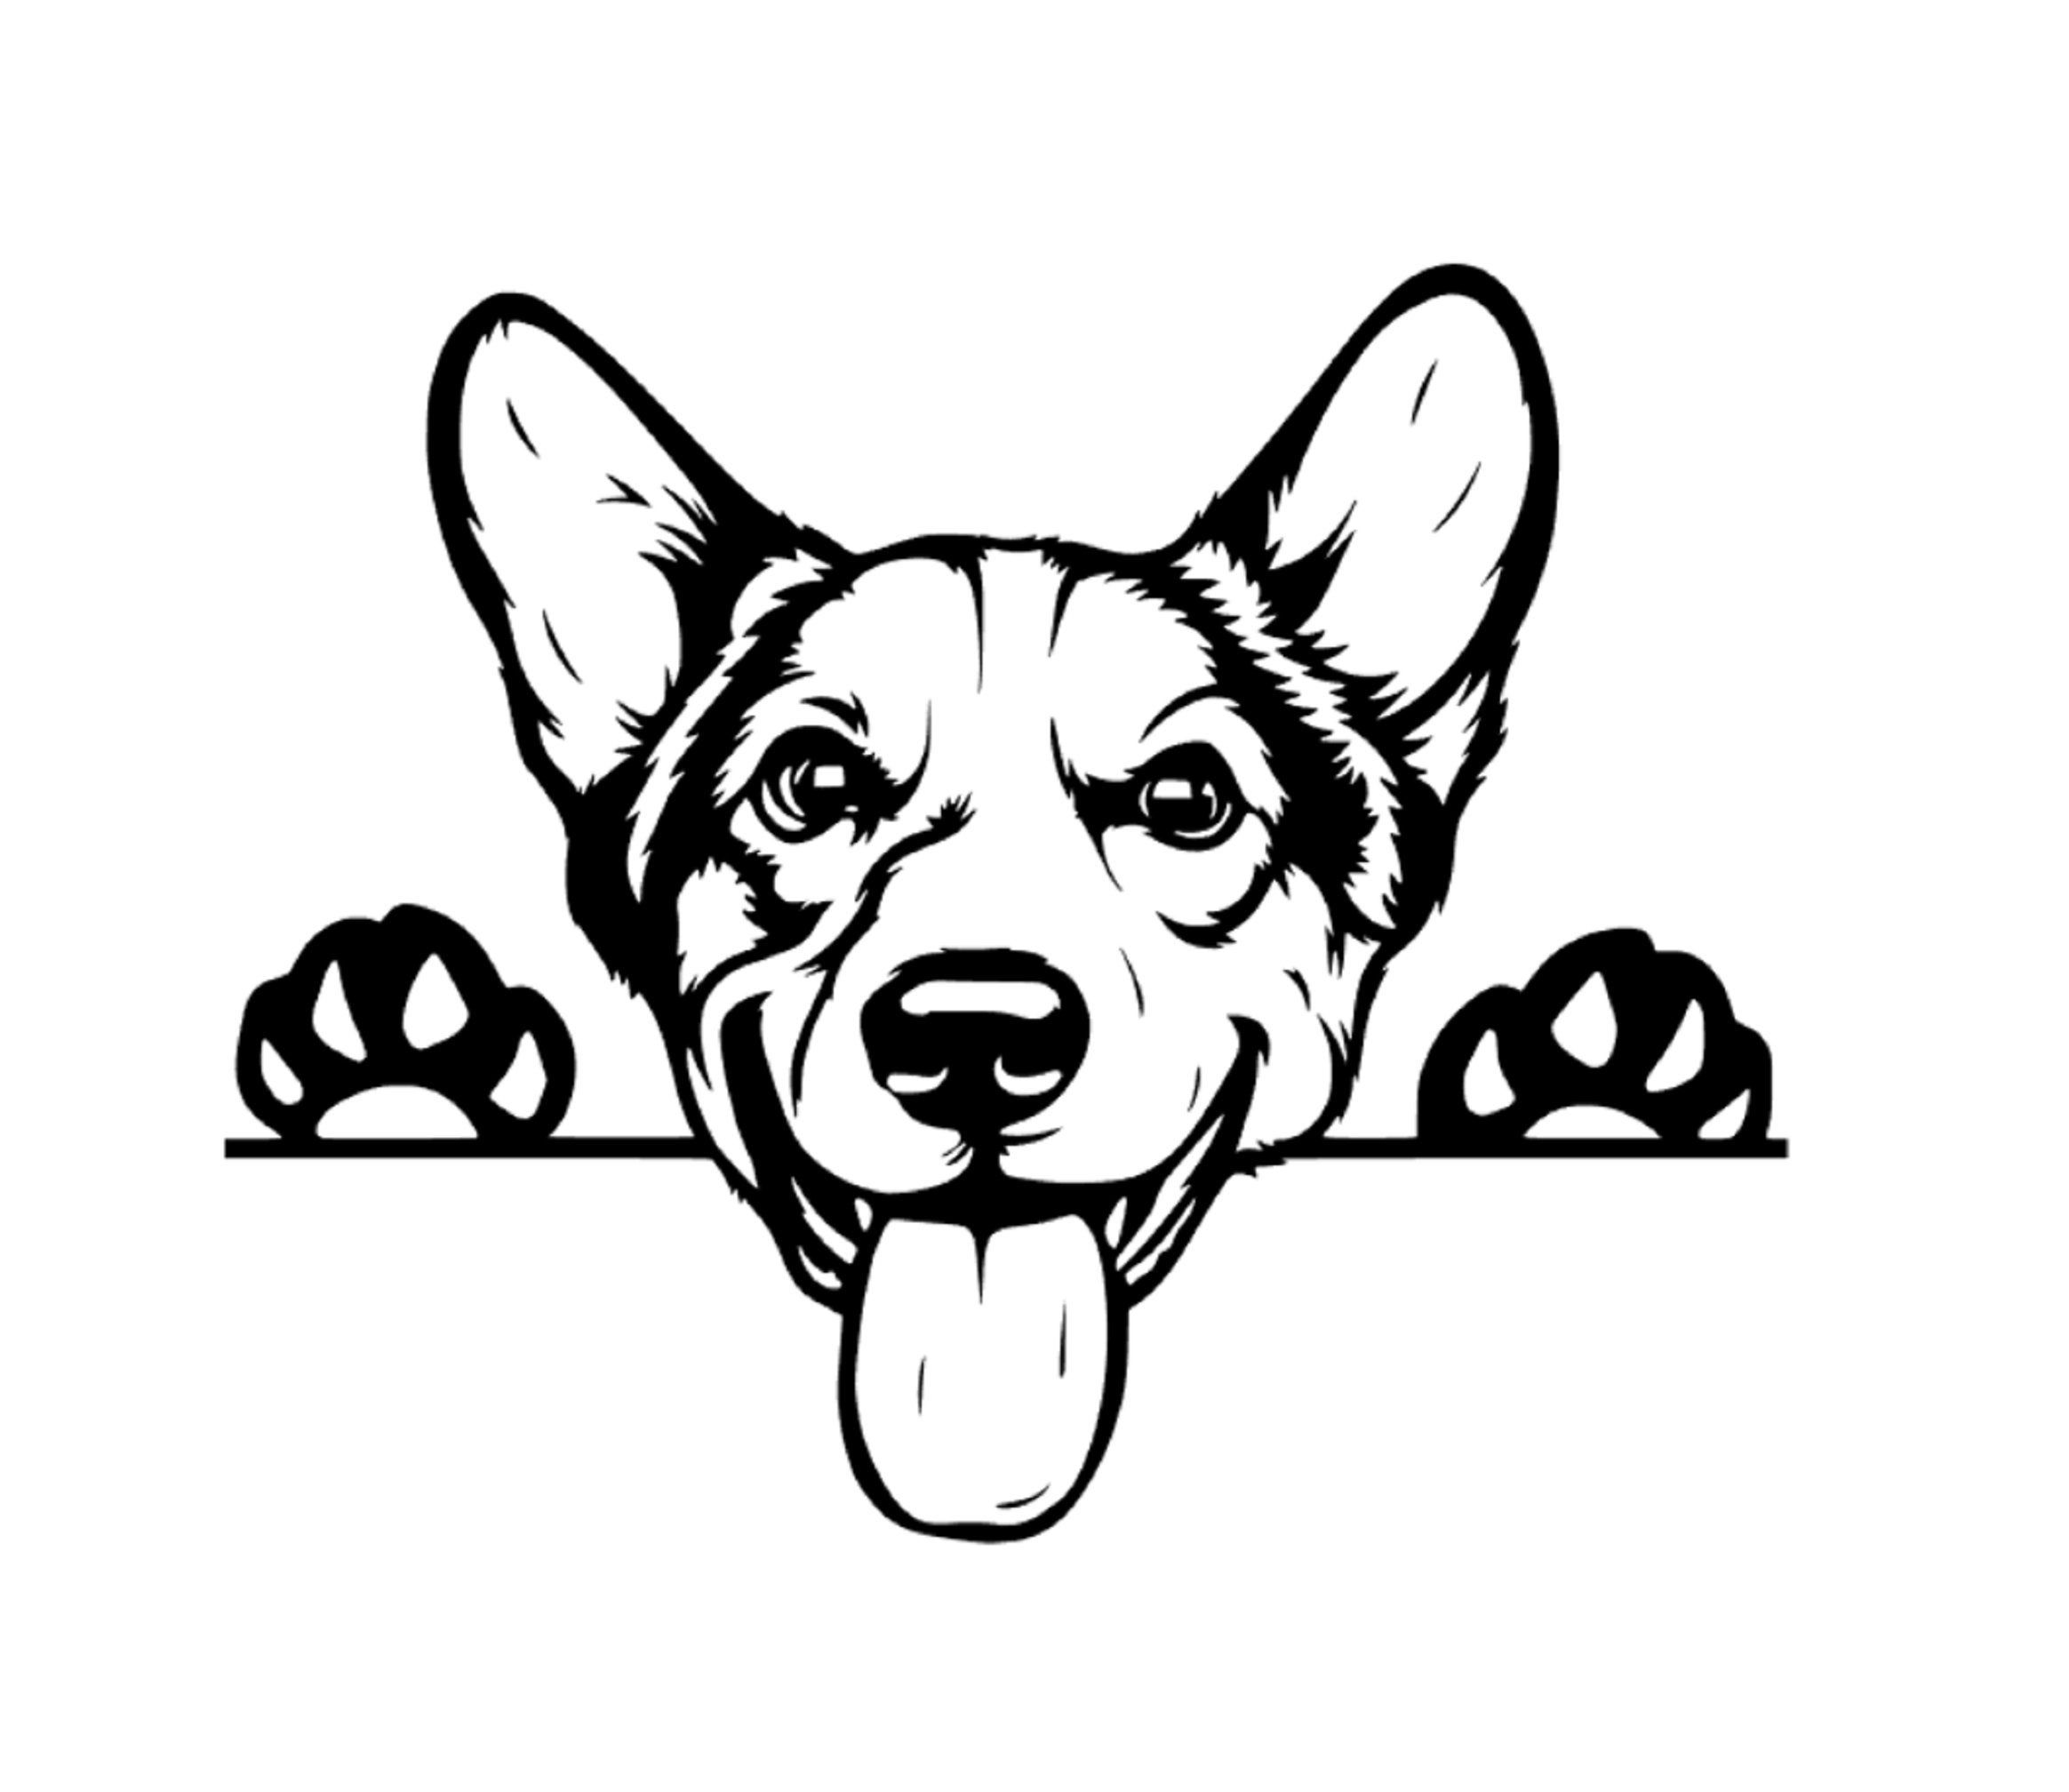 Corgi Peeking Dog Car Decal Sticker Corgi Dog Sticker Vinyl Window Cute Welsh Pembroke Corgi Gifts Corgi Lover Corgi Dog Corgis Dog Decals Corgi Gifts Corgi [ 2016 x 2328 Pixel ]